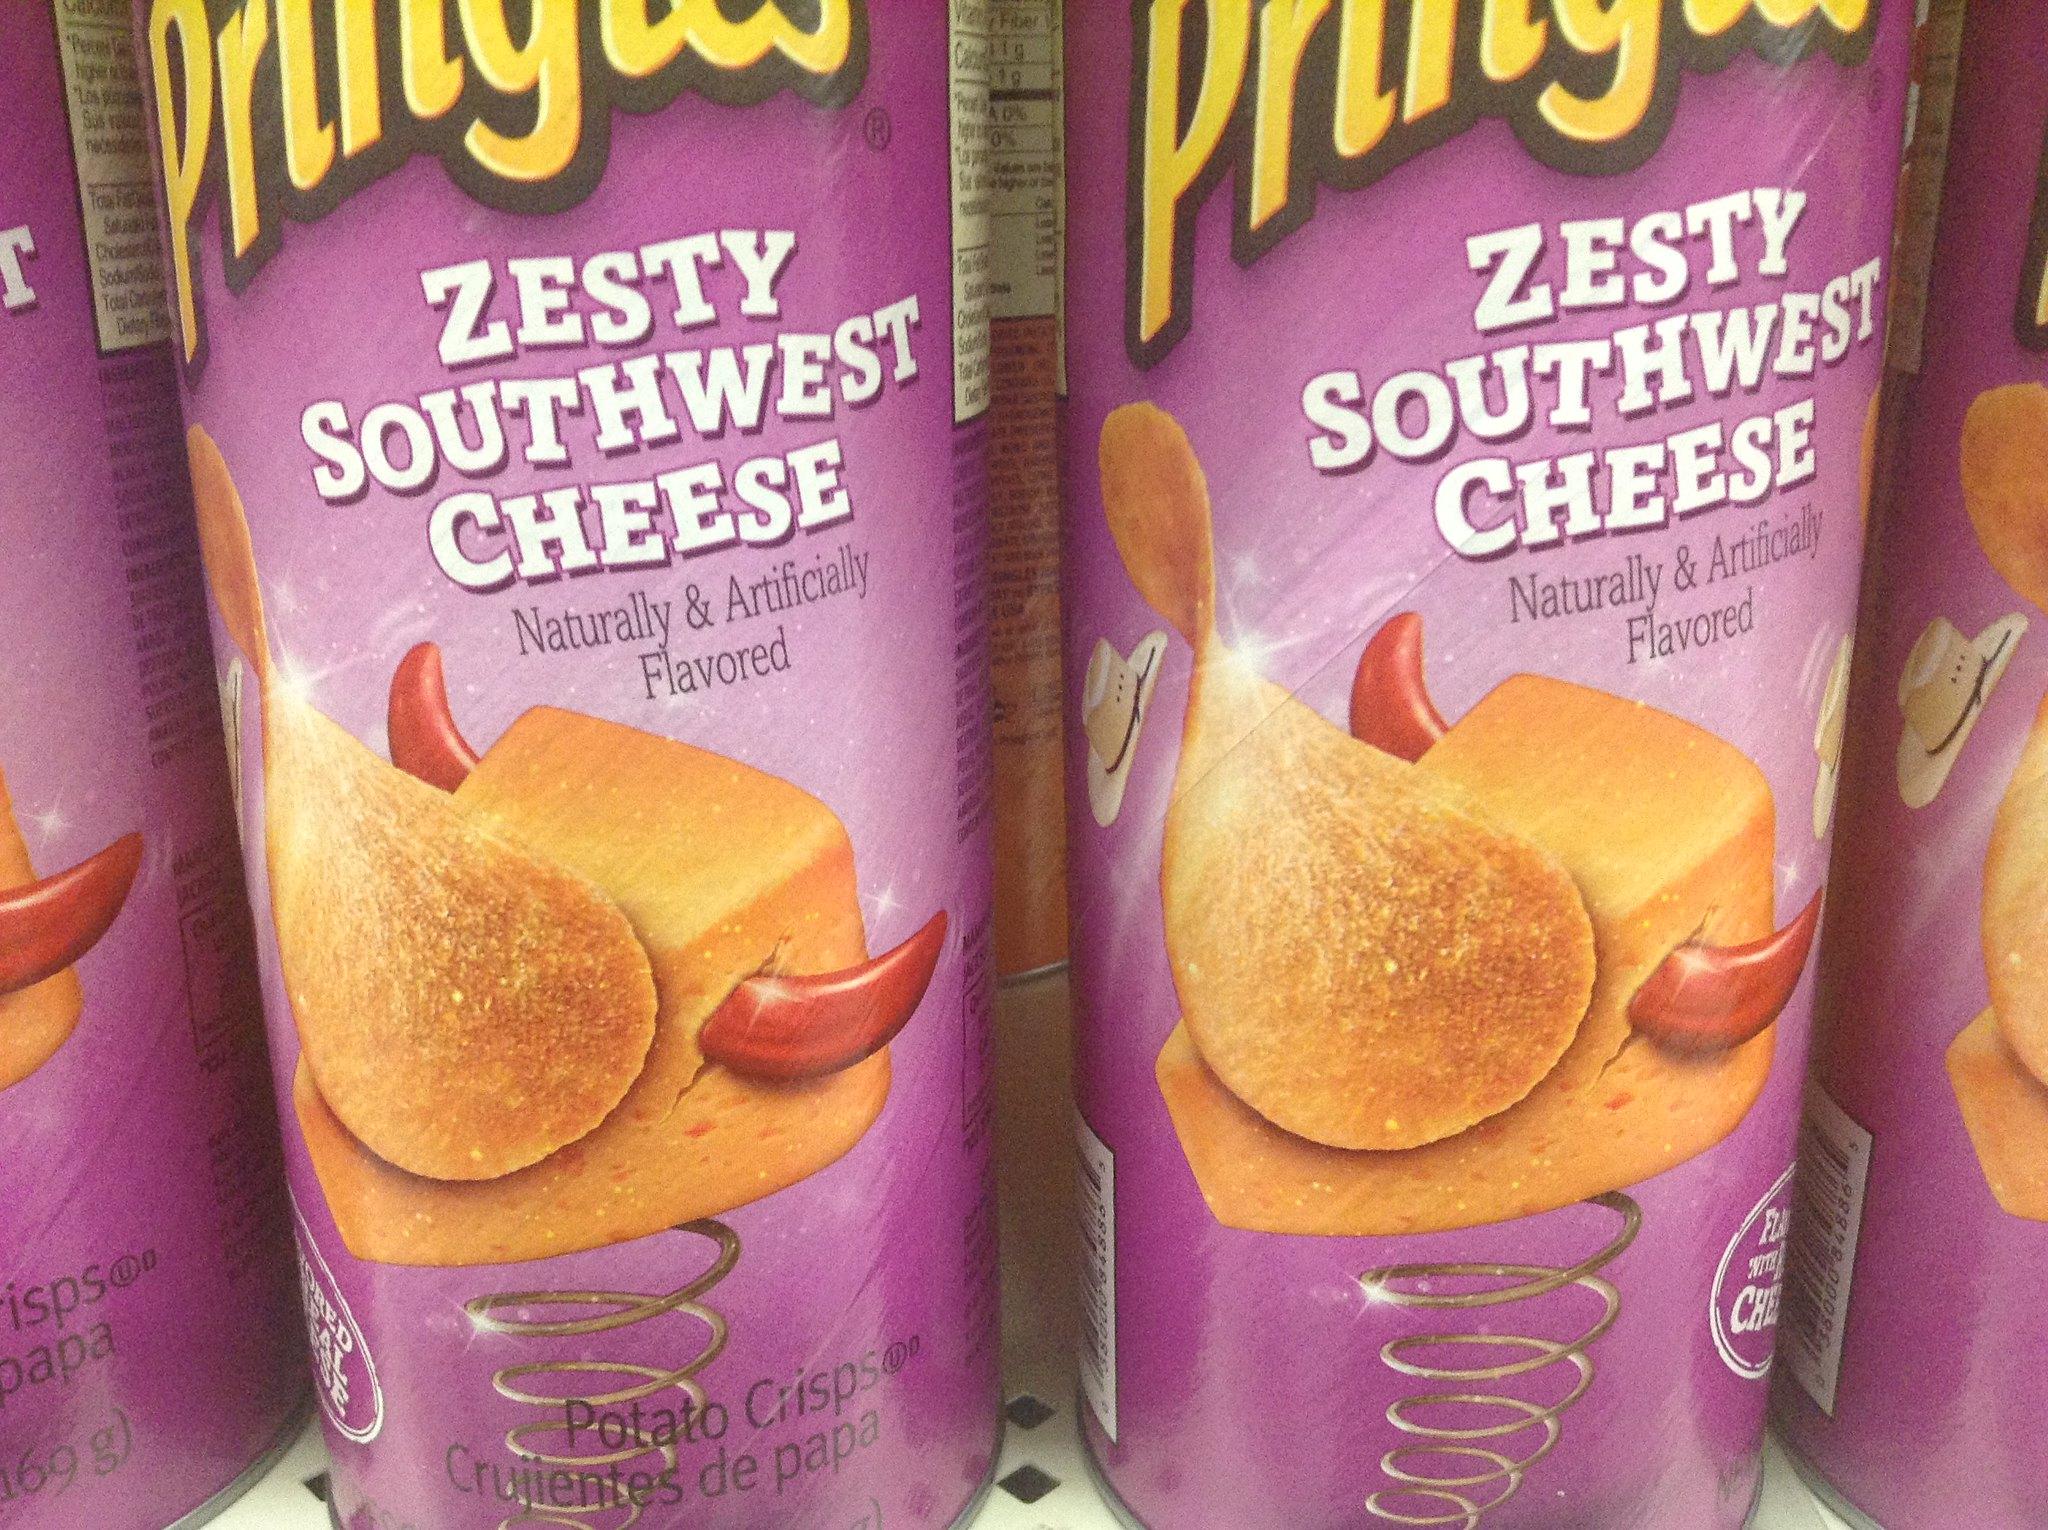 Pringles zesty southwest cheese